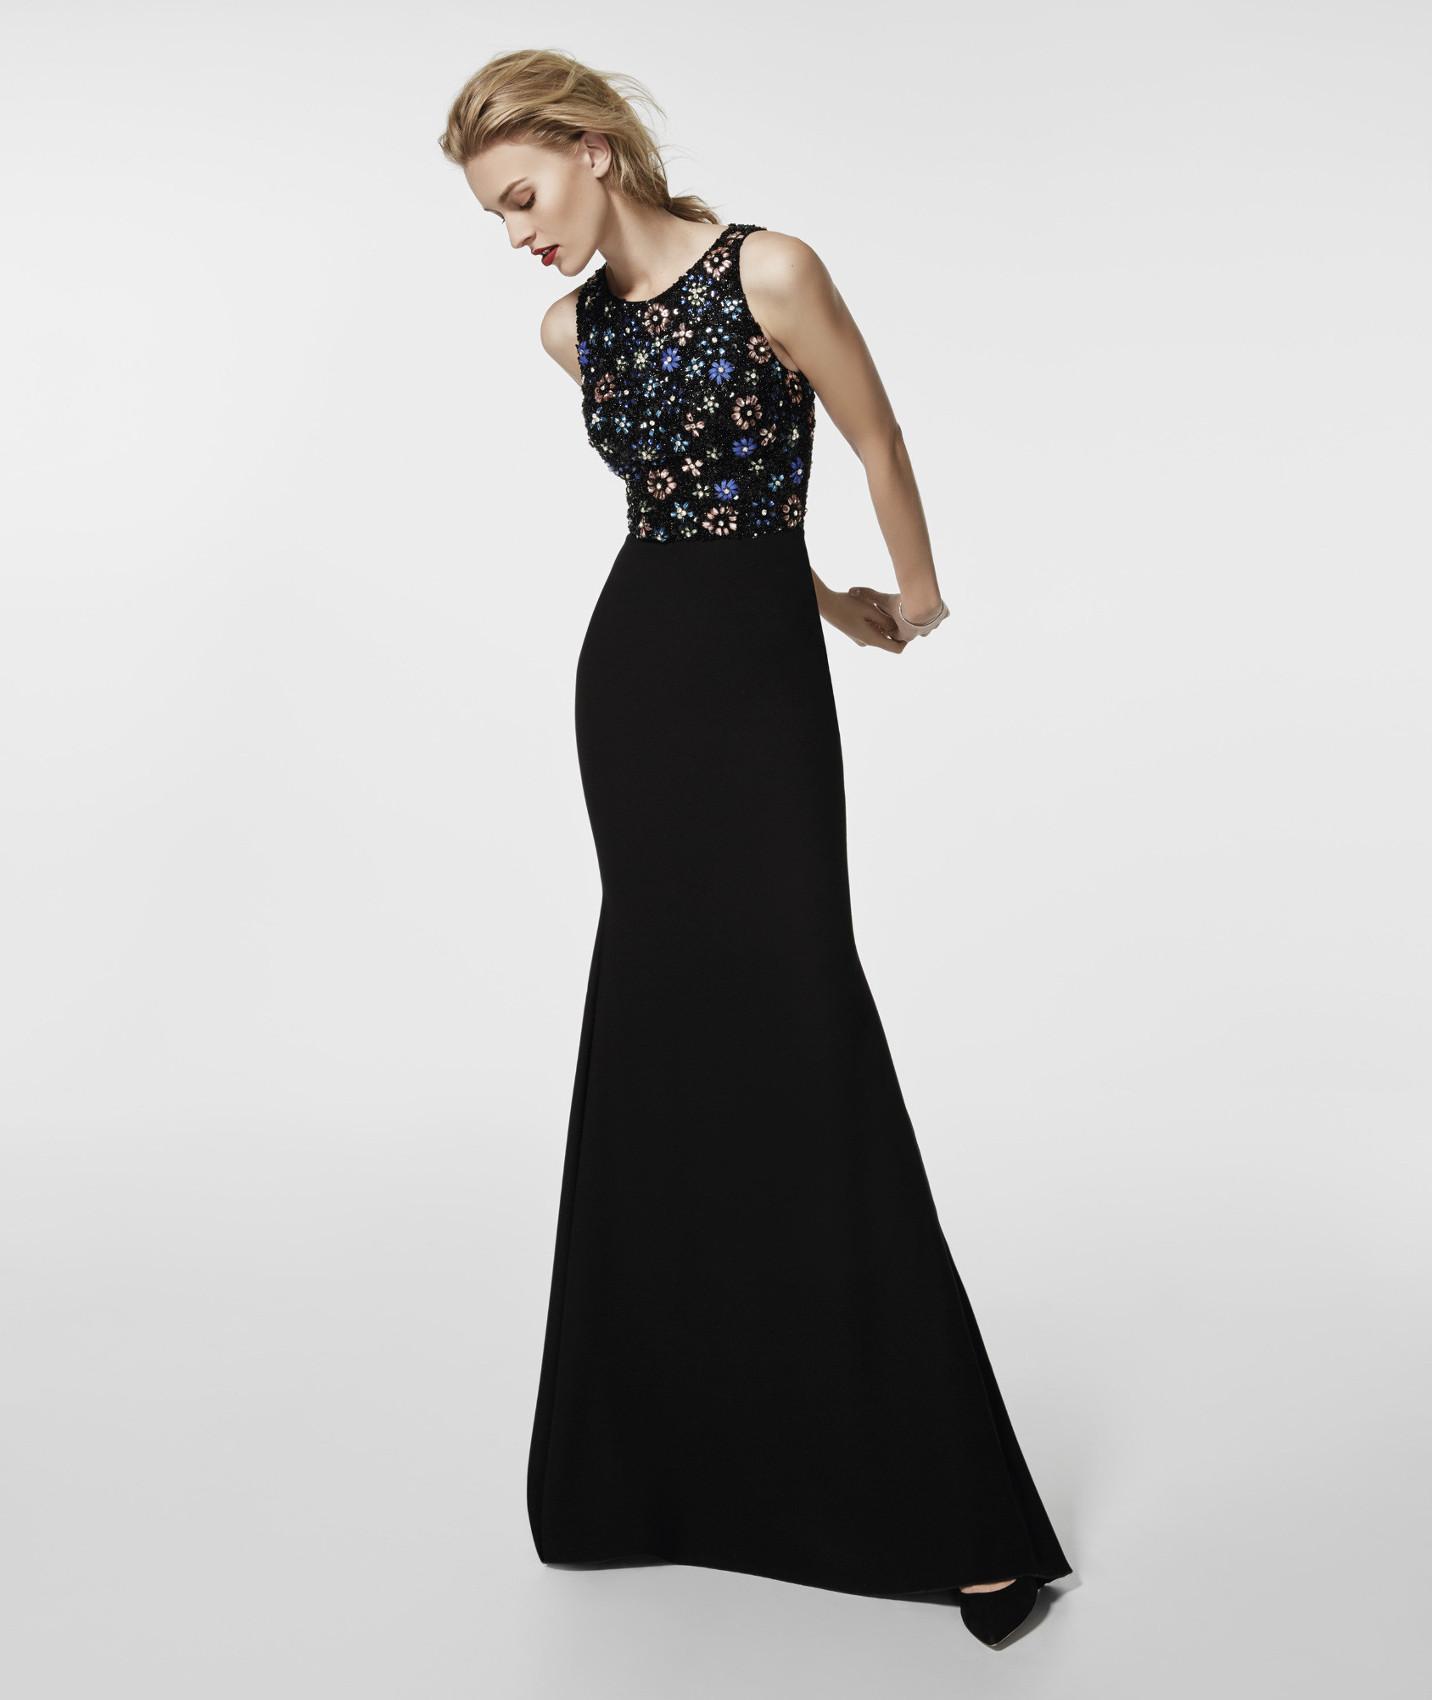 Gregaria suknelė